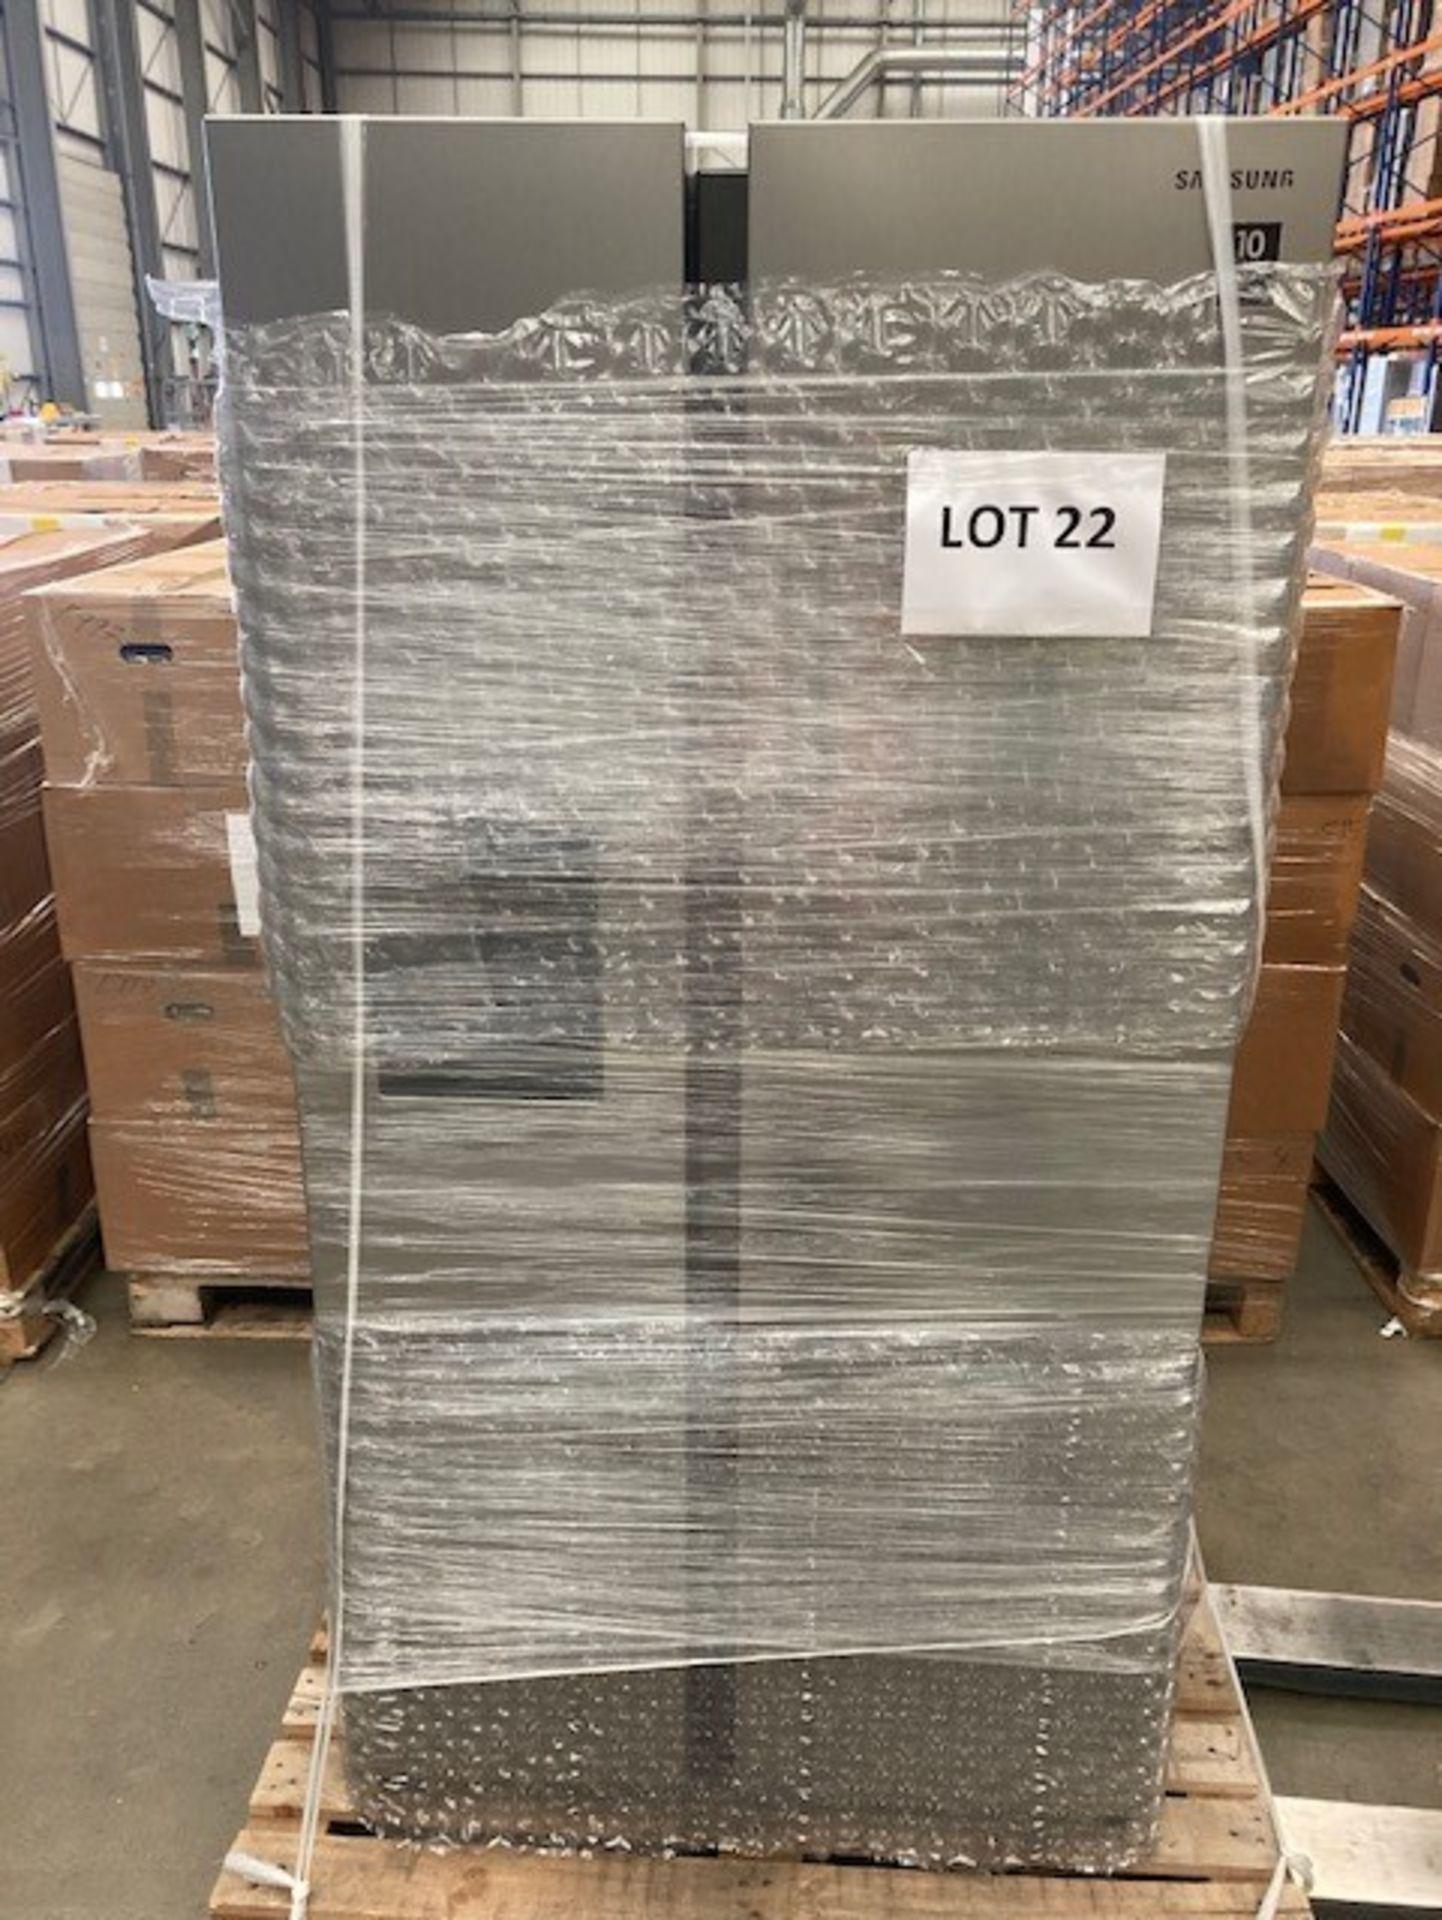 Pallet of 1 Samsung Water & Ice Fridge freezer. Latest selling price £1,329.99* - Image 4 of 9